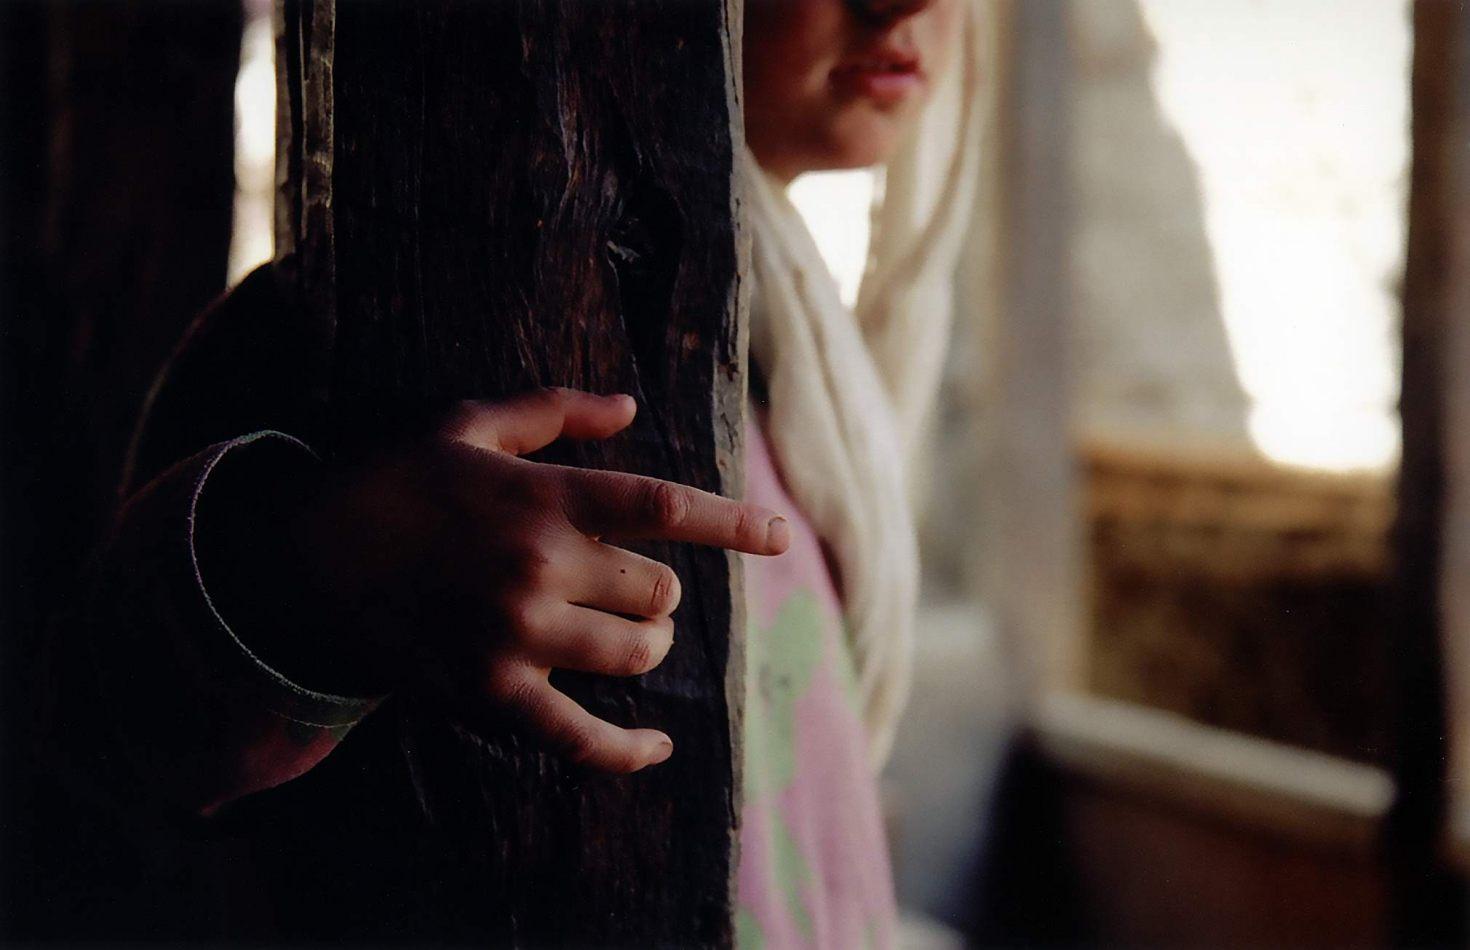 Anthony Ellis Photography: Zindabad - Old Wood and Young Fingers